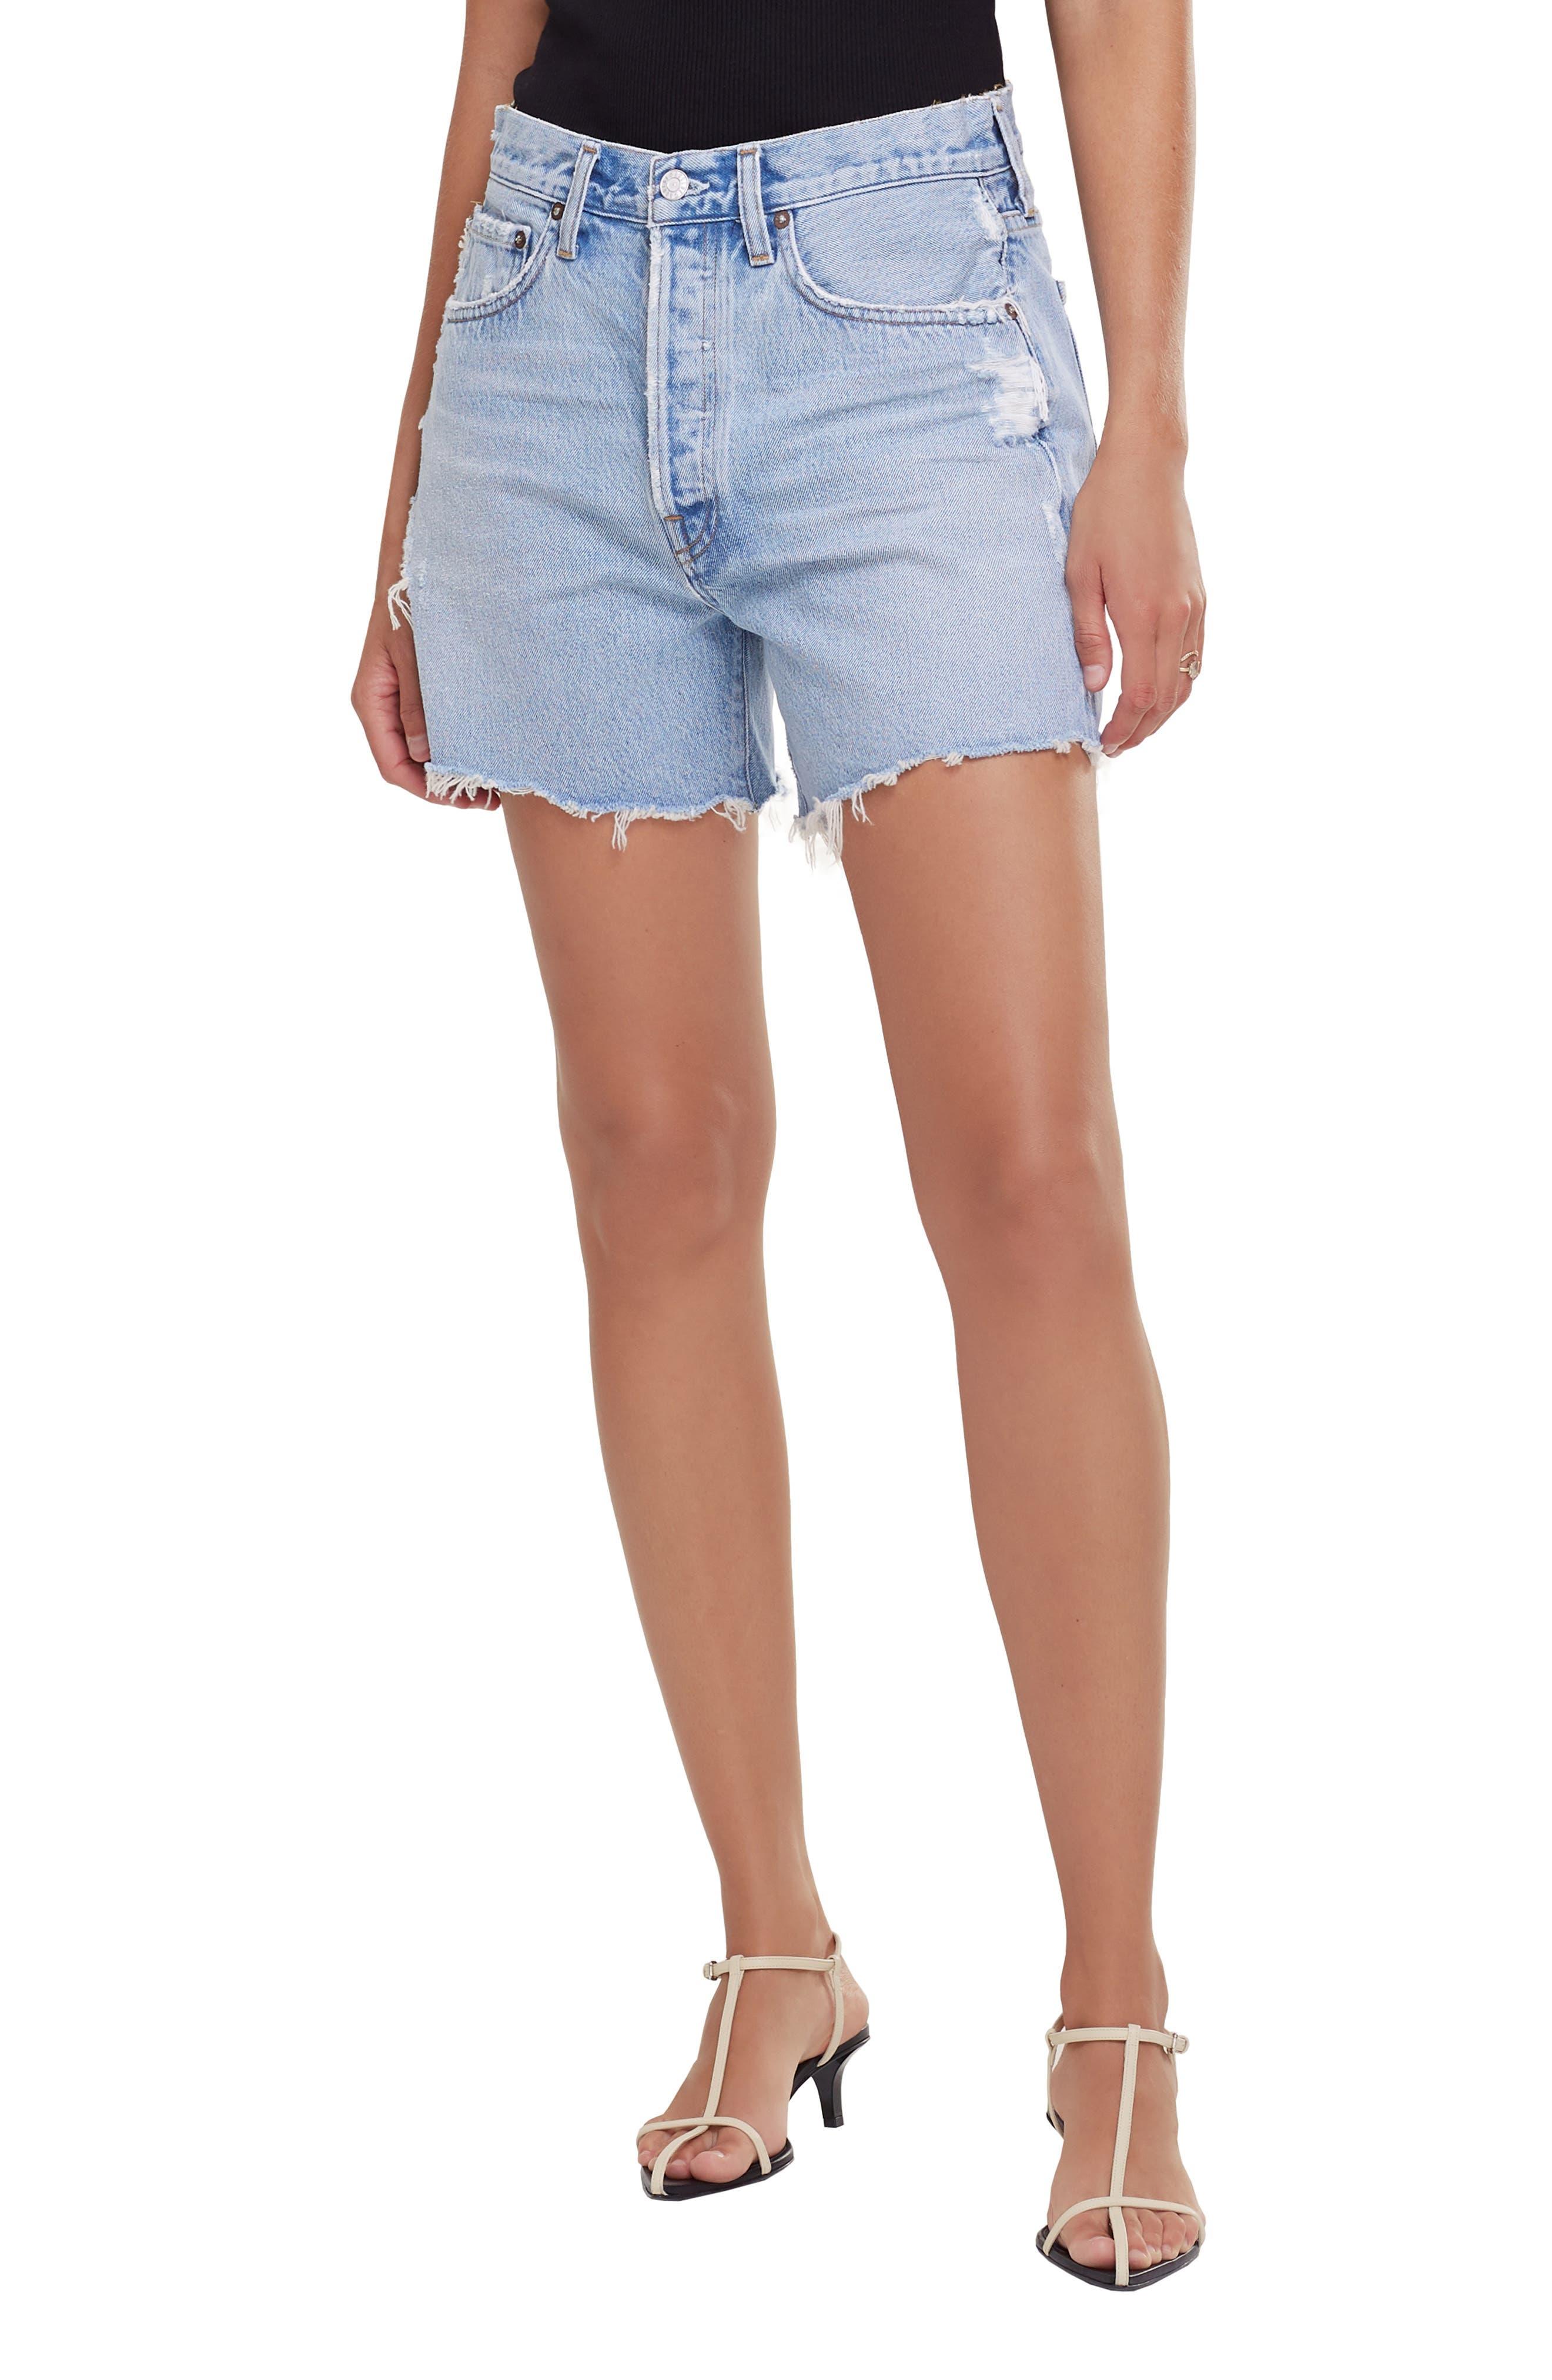 White Light Orange Floral Butterfly Print denim Shorts Womens High Waisted Shorts Jeans Shorts Medium Size